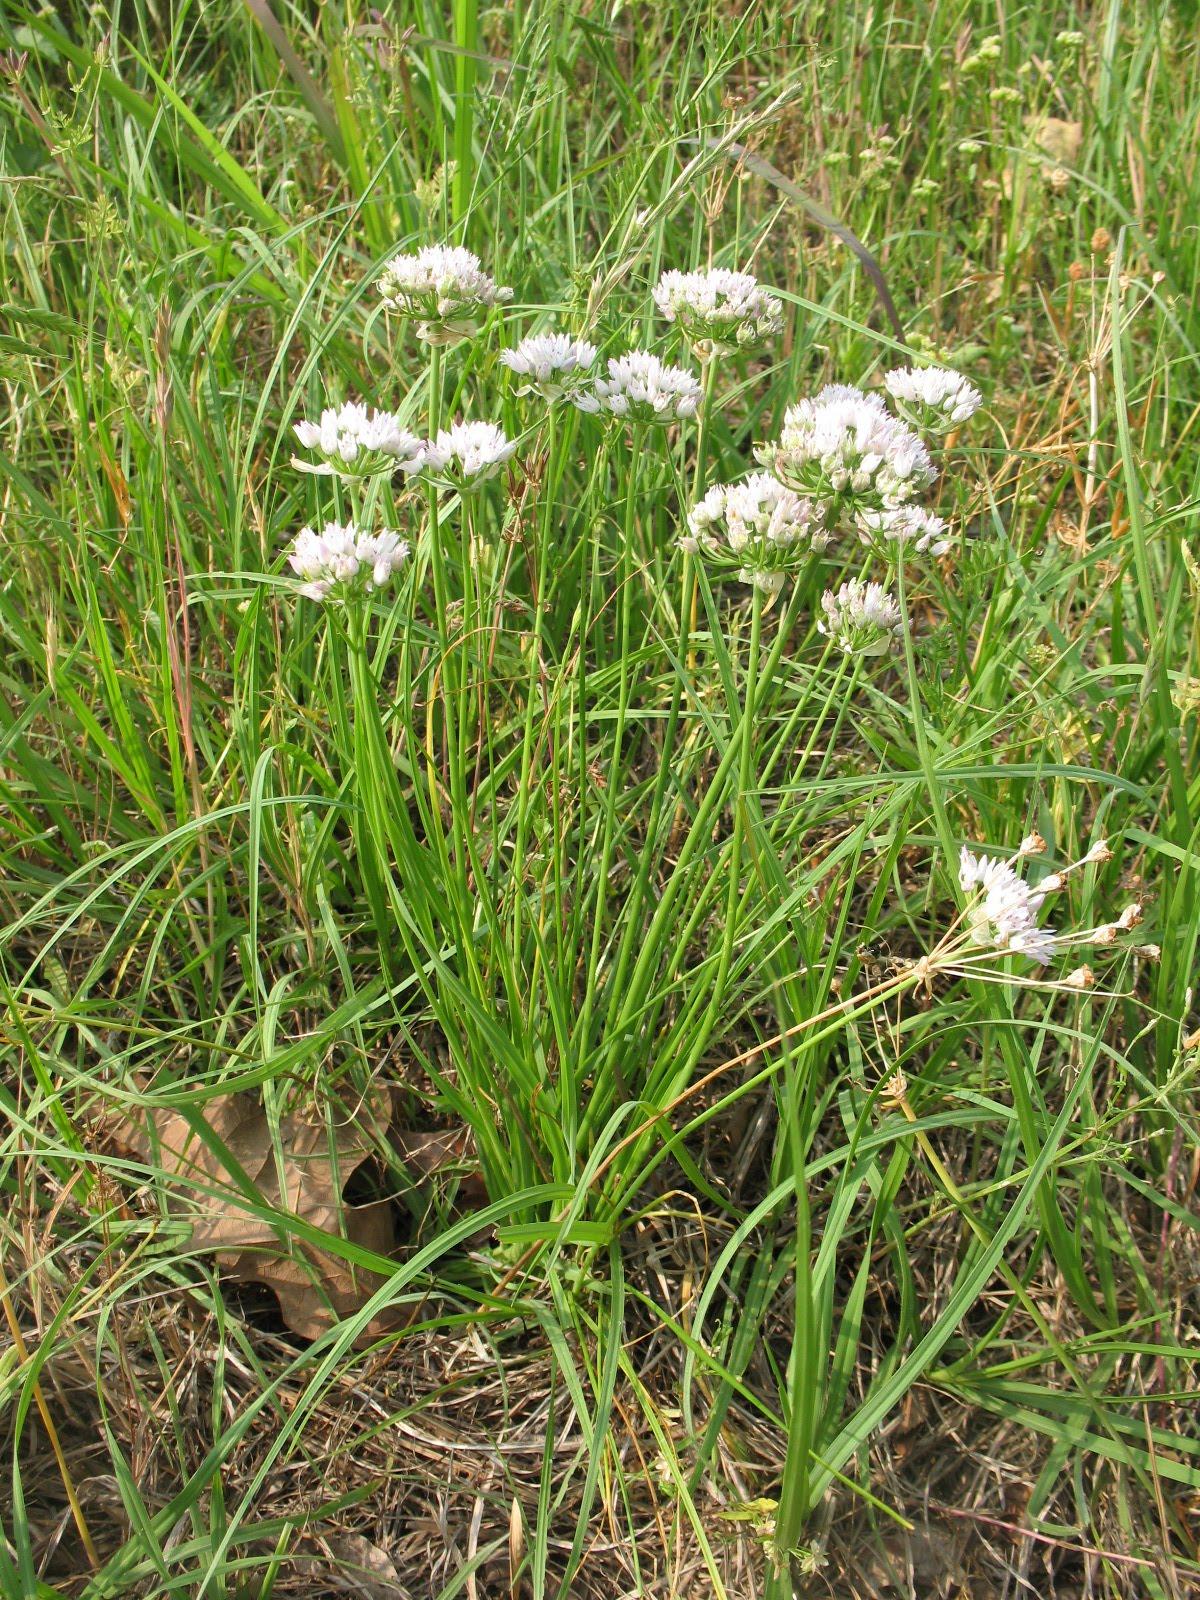 Sensible Survival: Edible Wild Plants - Wild Onions